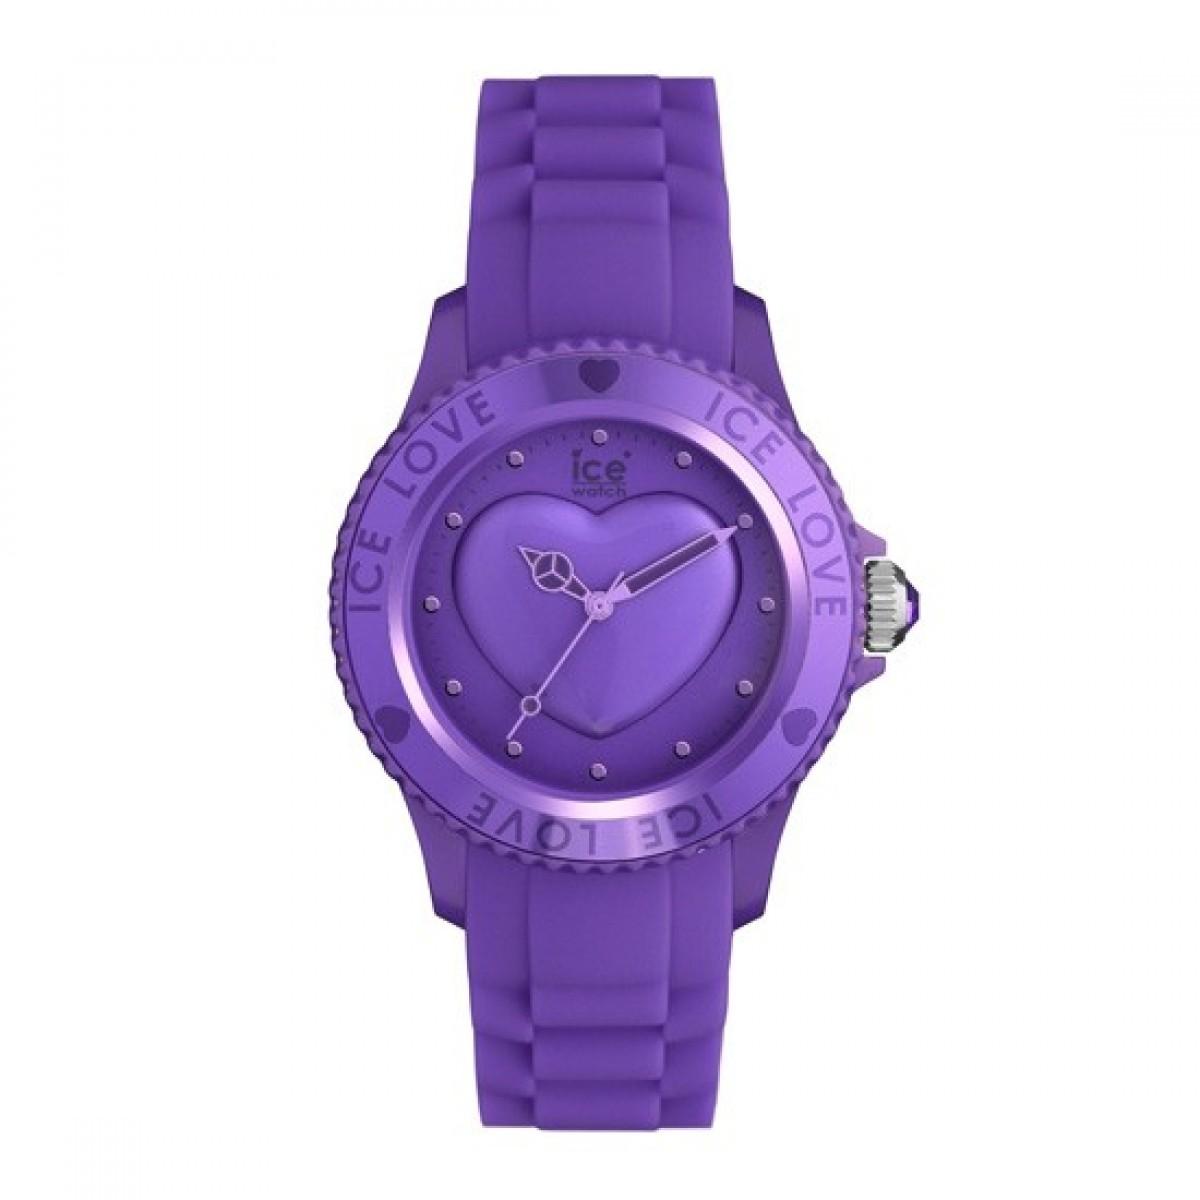 Часовник Ice-Watch LO.LR.S.S.11 Small